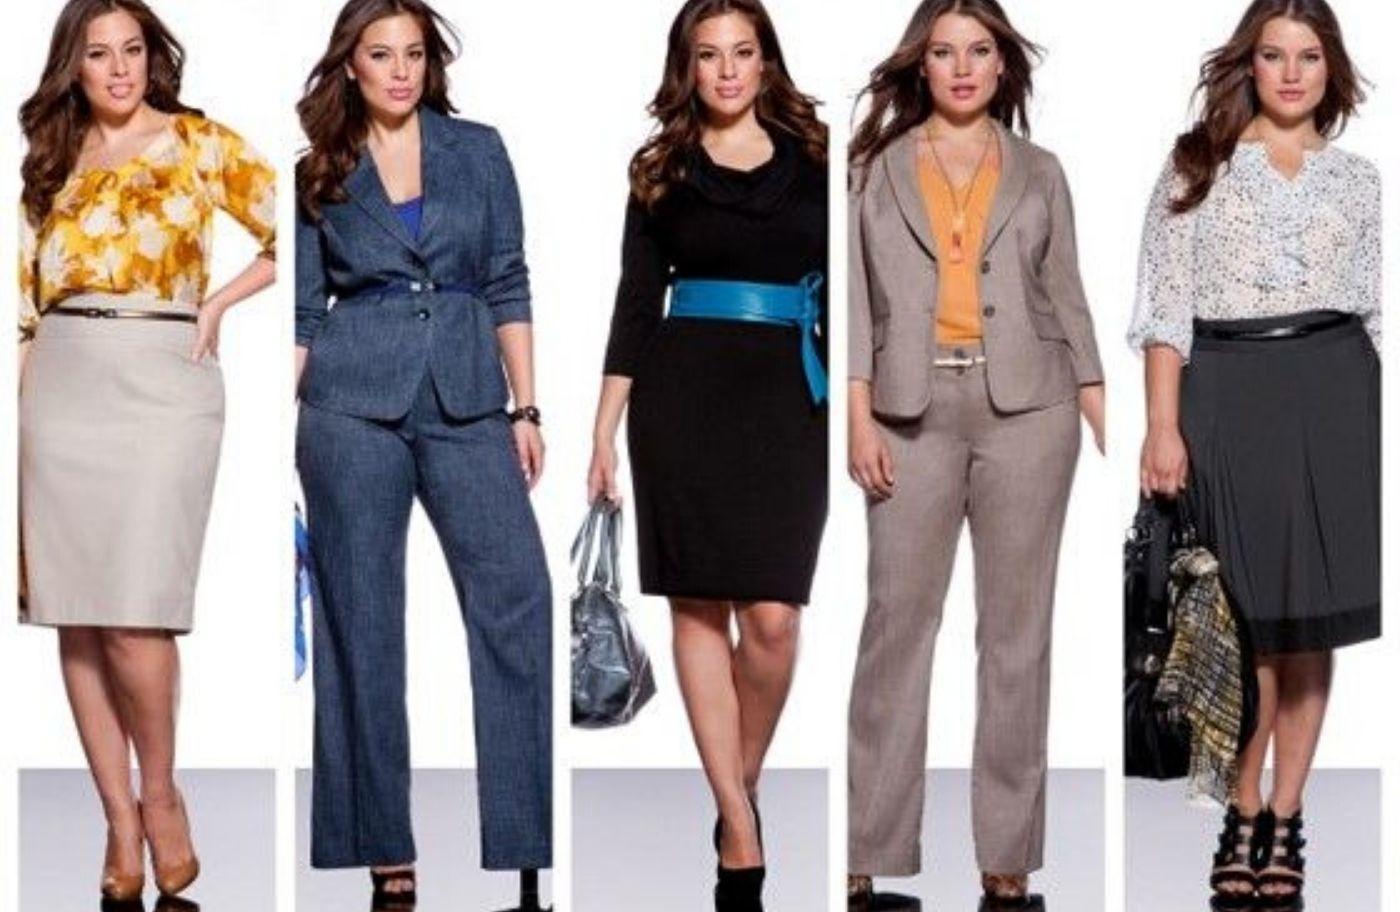 Plus Size Business Attire for Women